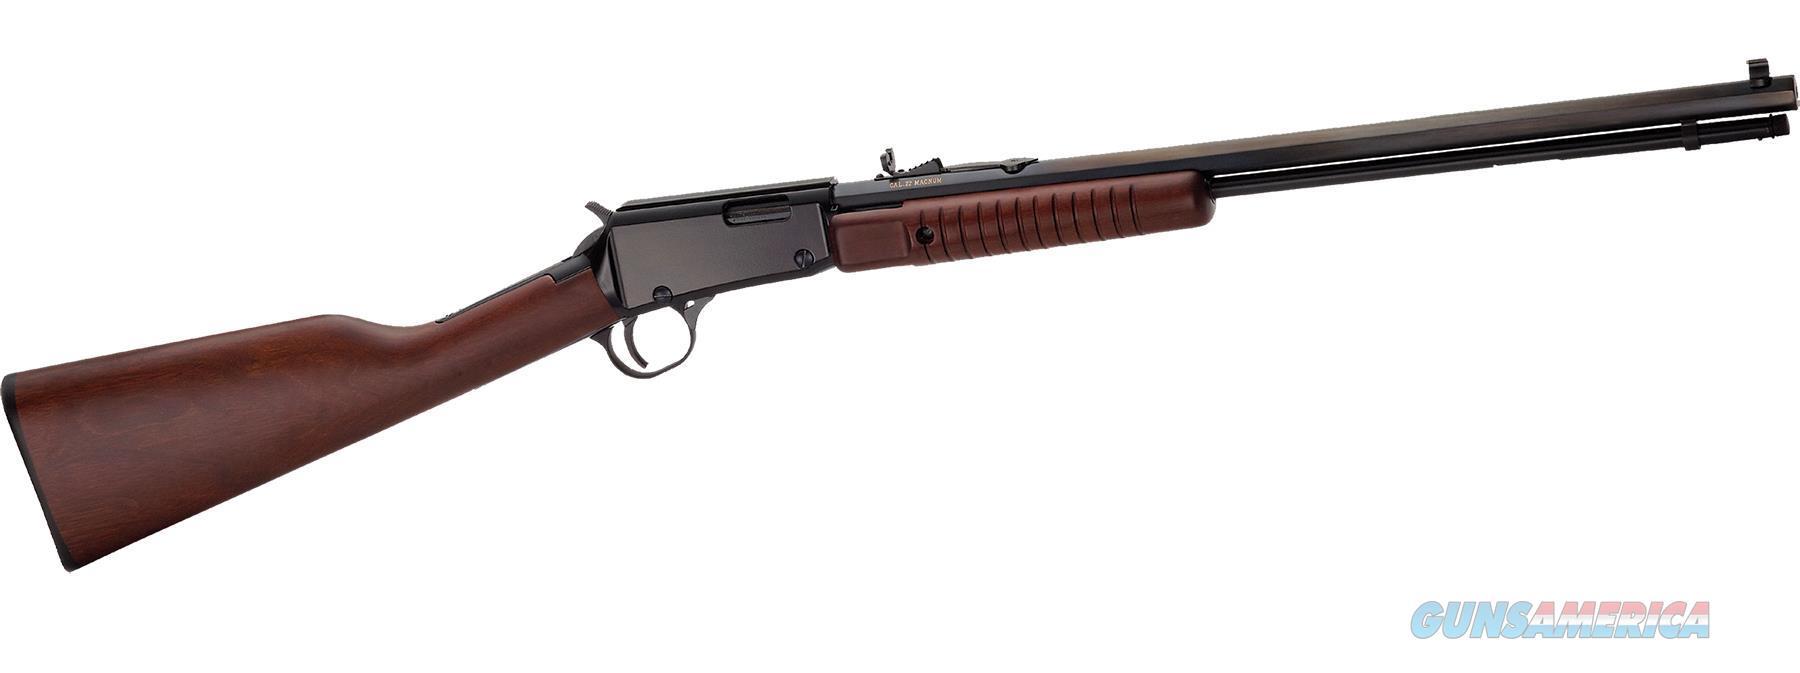 "Henry H003tm Pump  22 Winchester Magnum Rimfire (Wmr) 20.5"" 12+1 American Walnut Stk Blued H003TM  Guns > Rifles > H Misc Rifles"